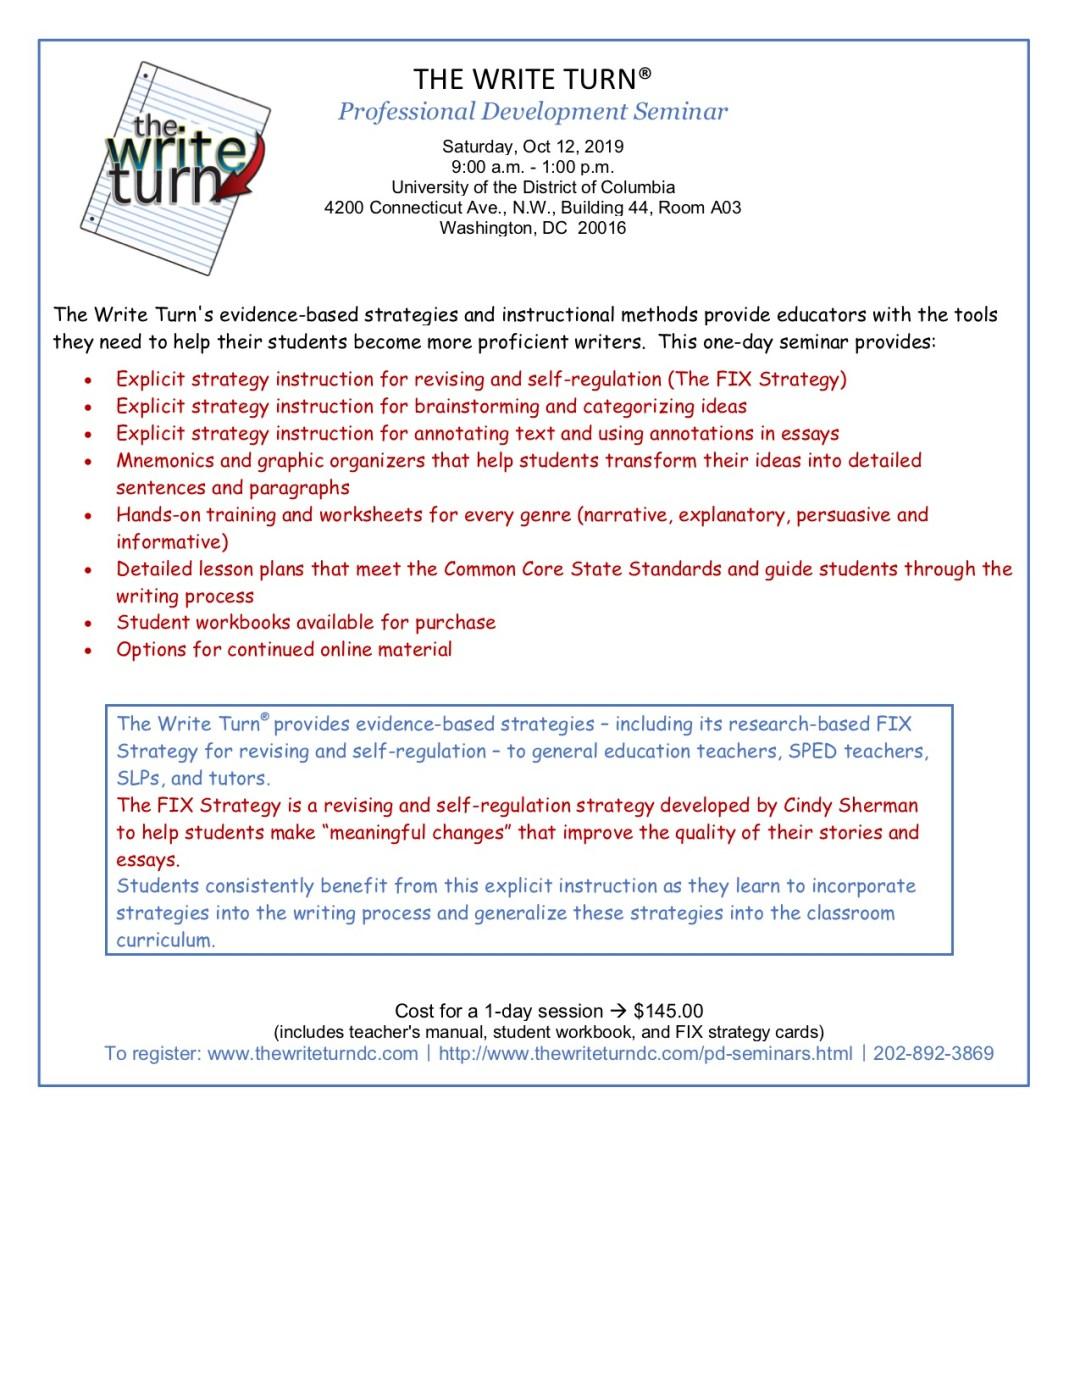 PD Seminar 101219 - DCSHA flyer.jpg